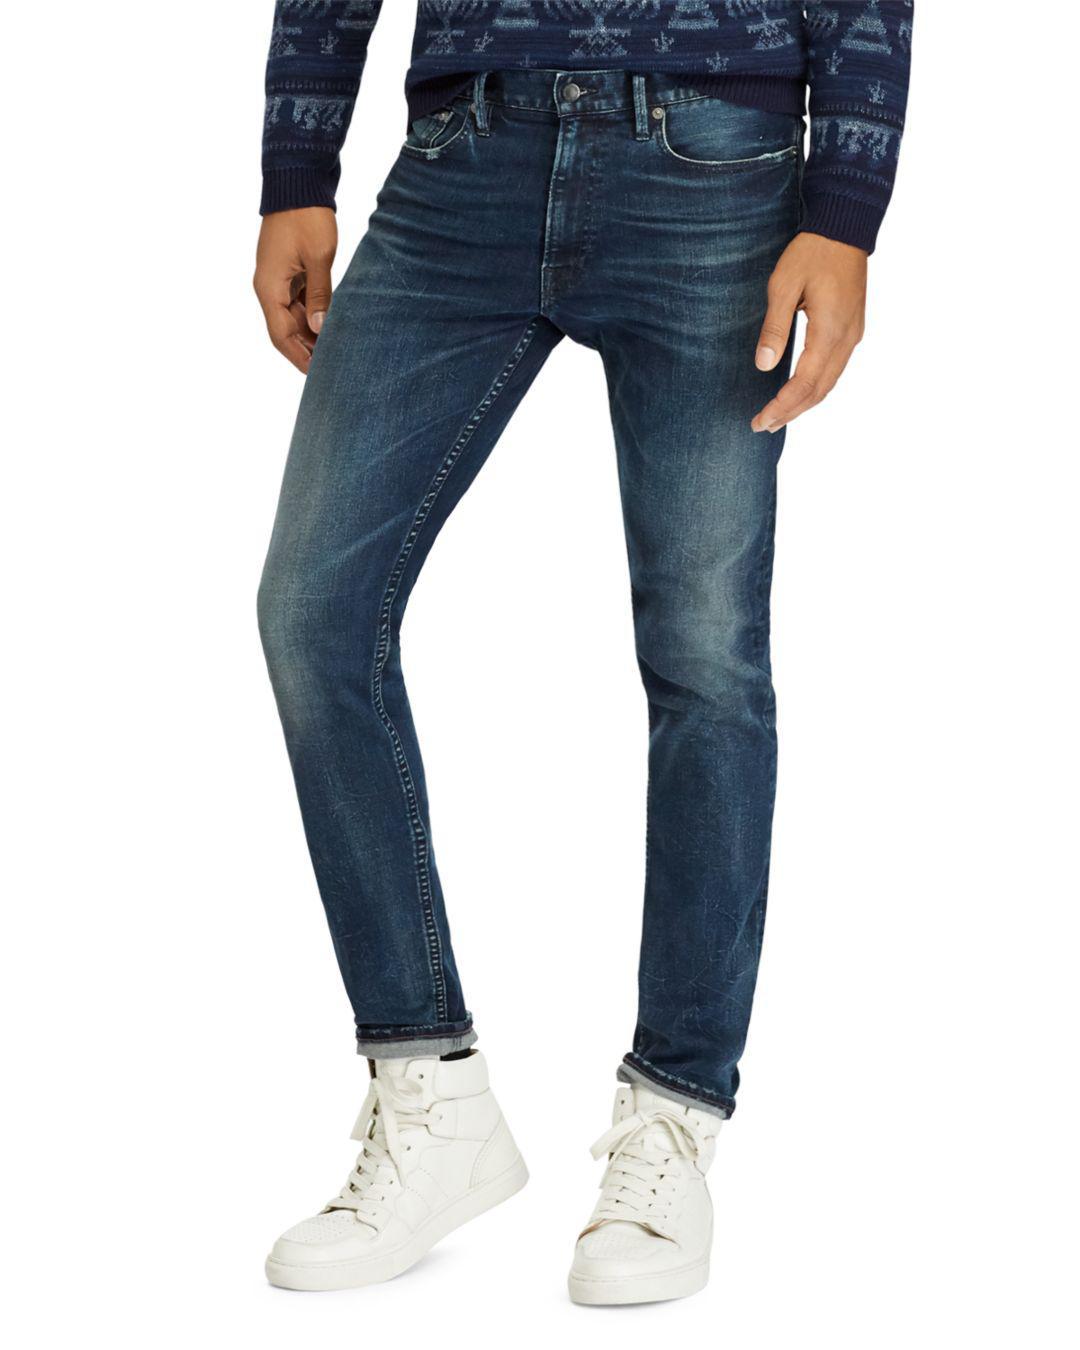 4f2b4a6c4 Lyst - Polo Ralph Lauren Men s Slim Fit Jeans - Blue - Size 30x32 in ...